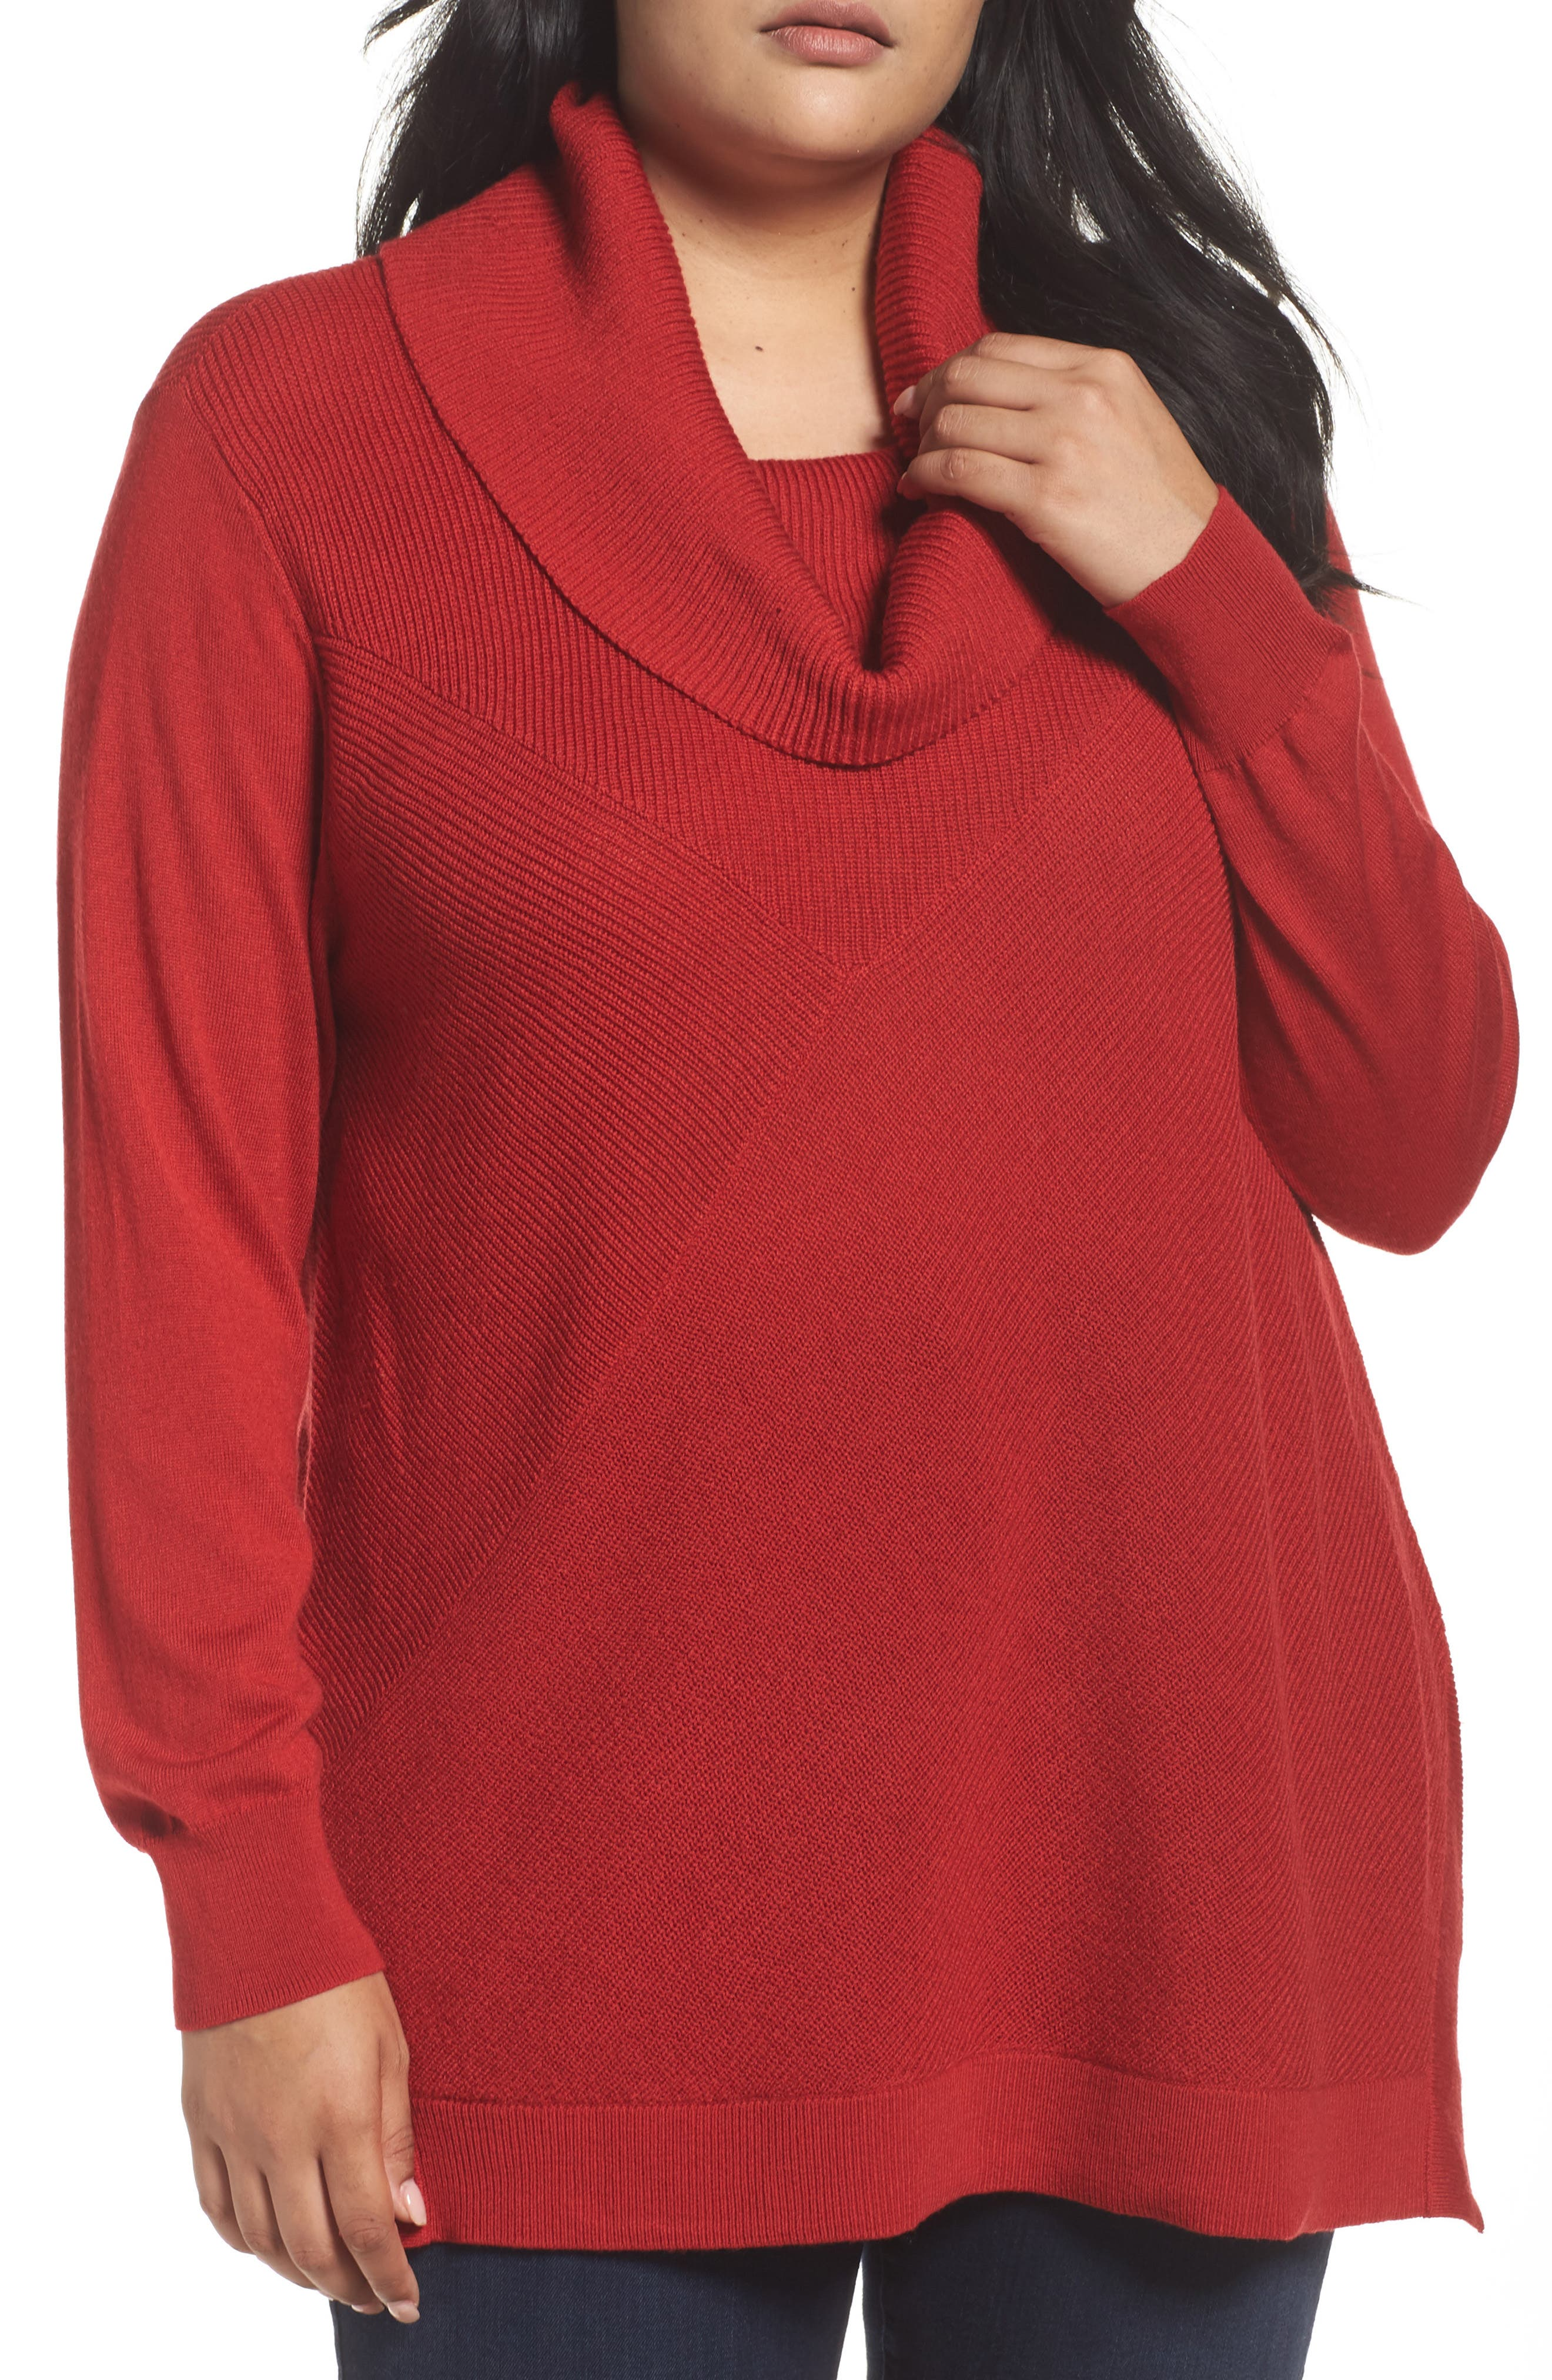 Main Image - Sejour Cowl Neck Ribbed Trim Pullover (Plus Size)